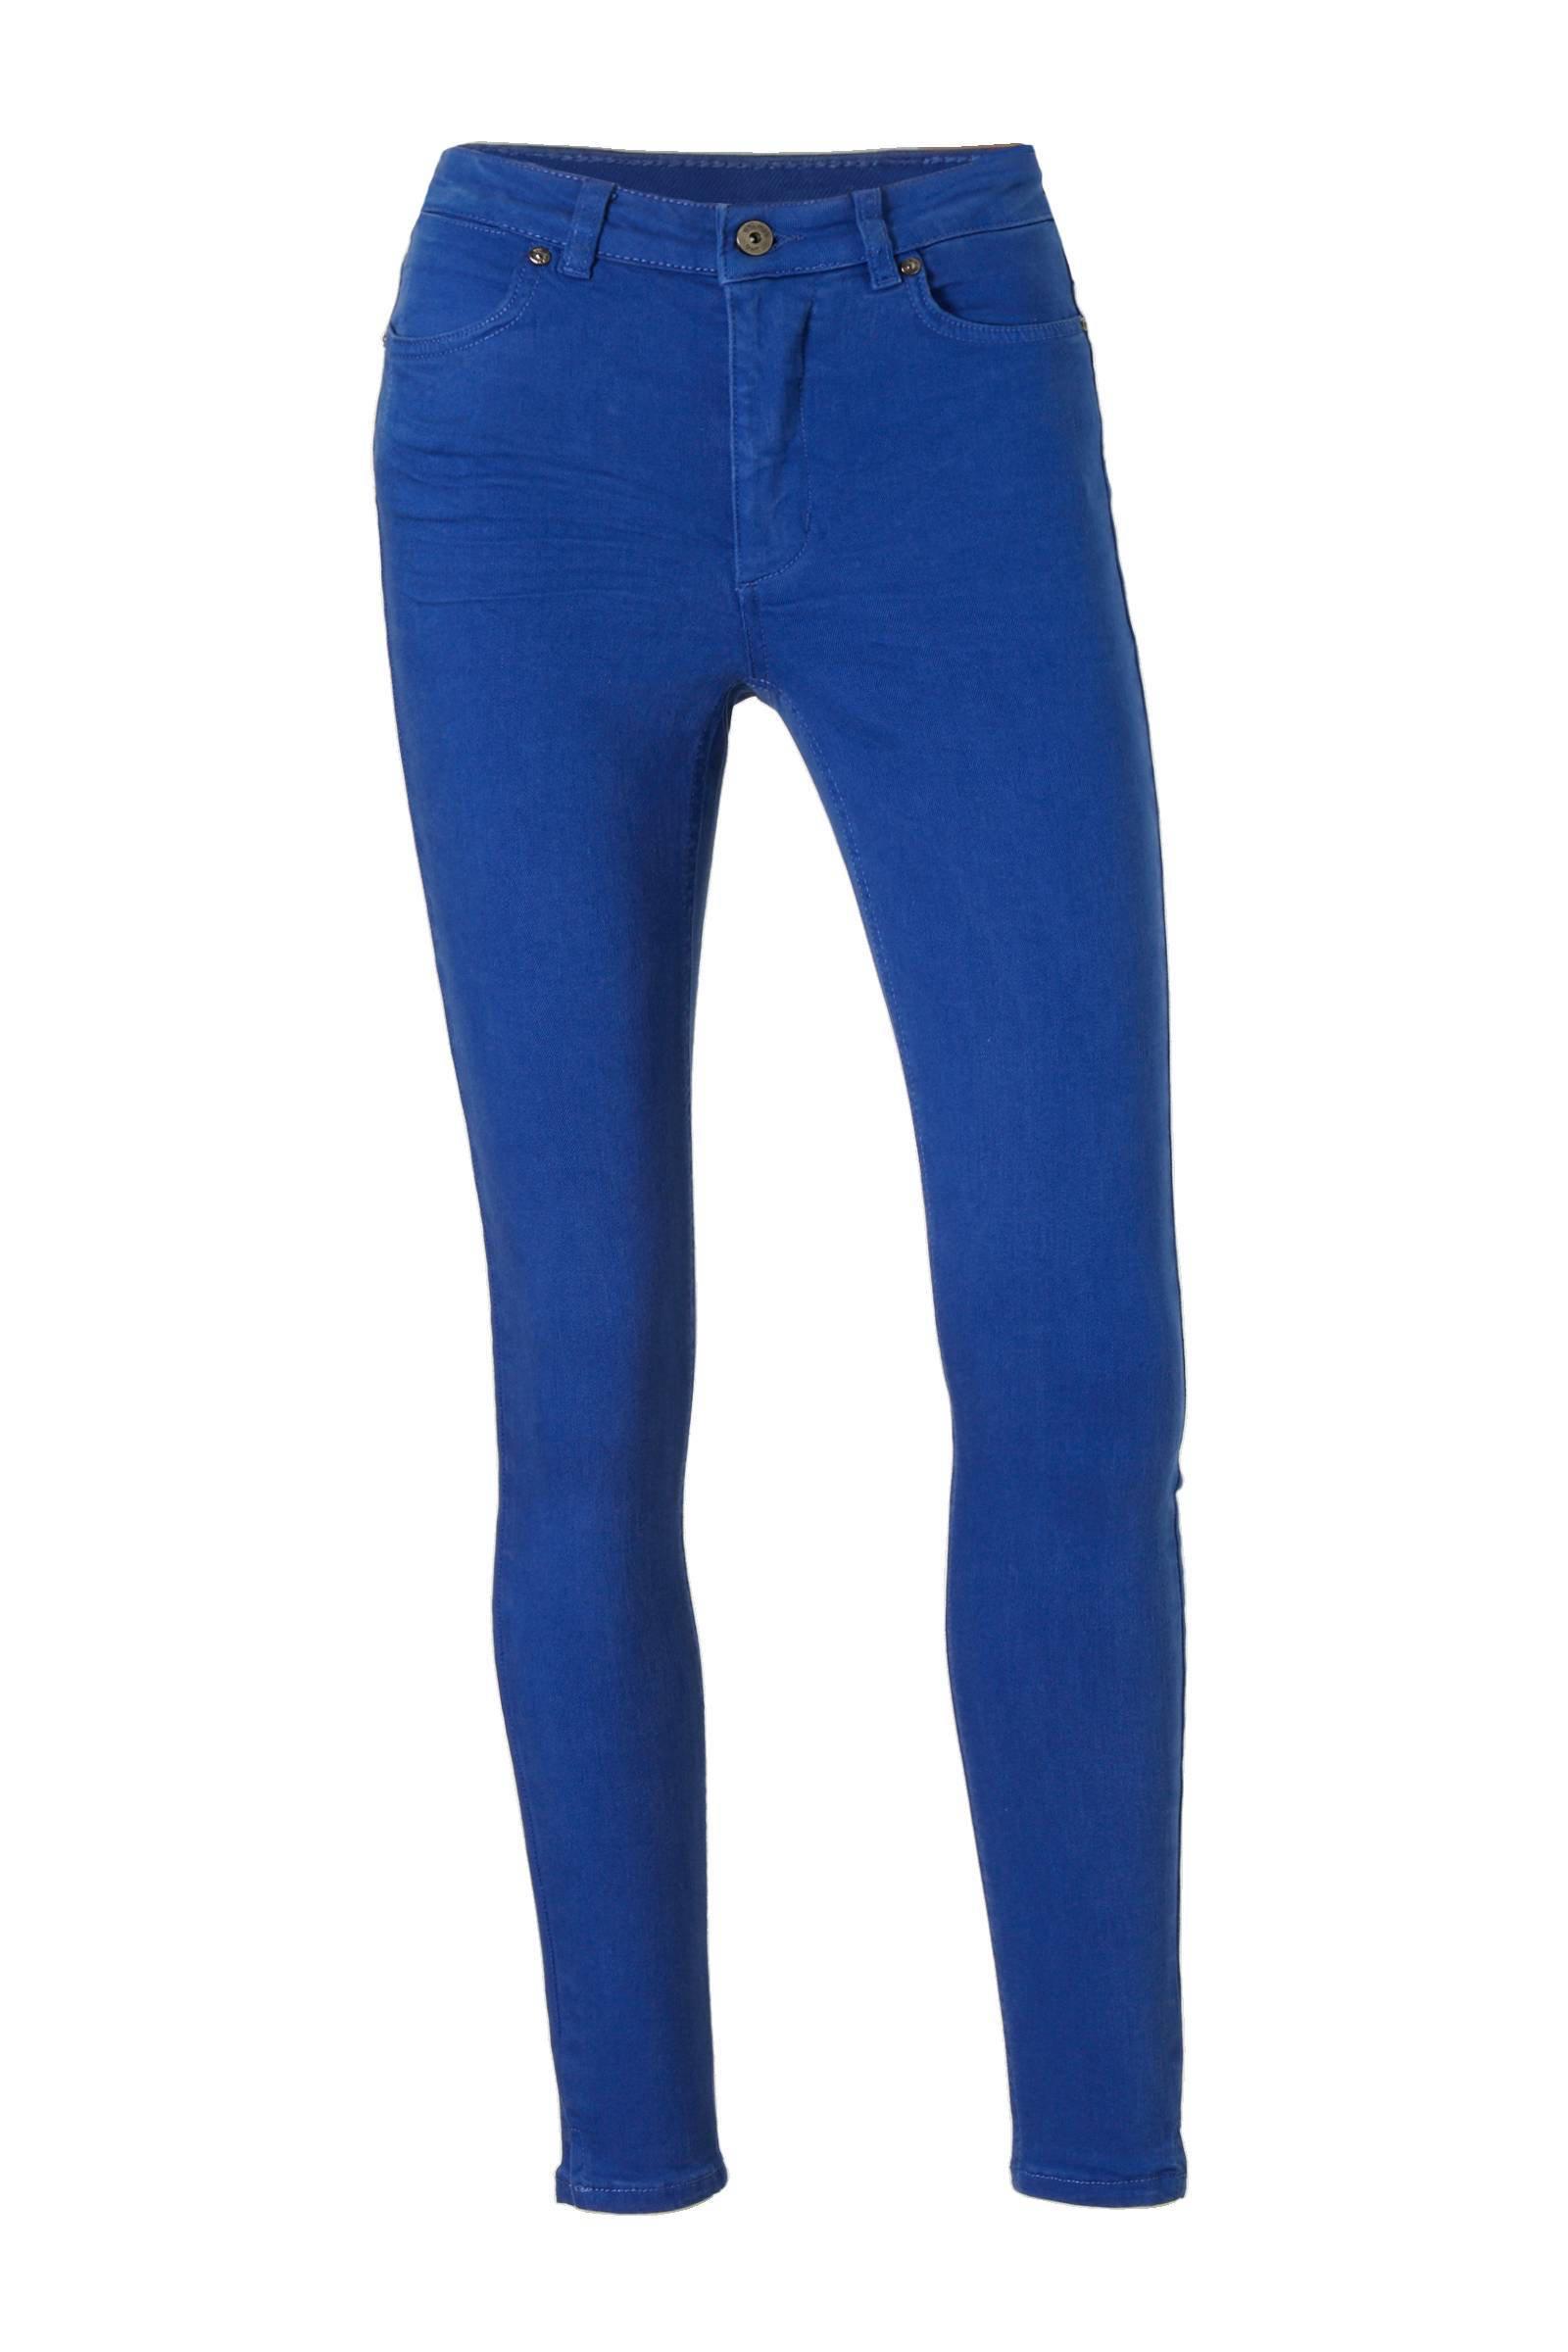 whkmp's own skinny high waist non denim (dames)